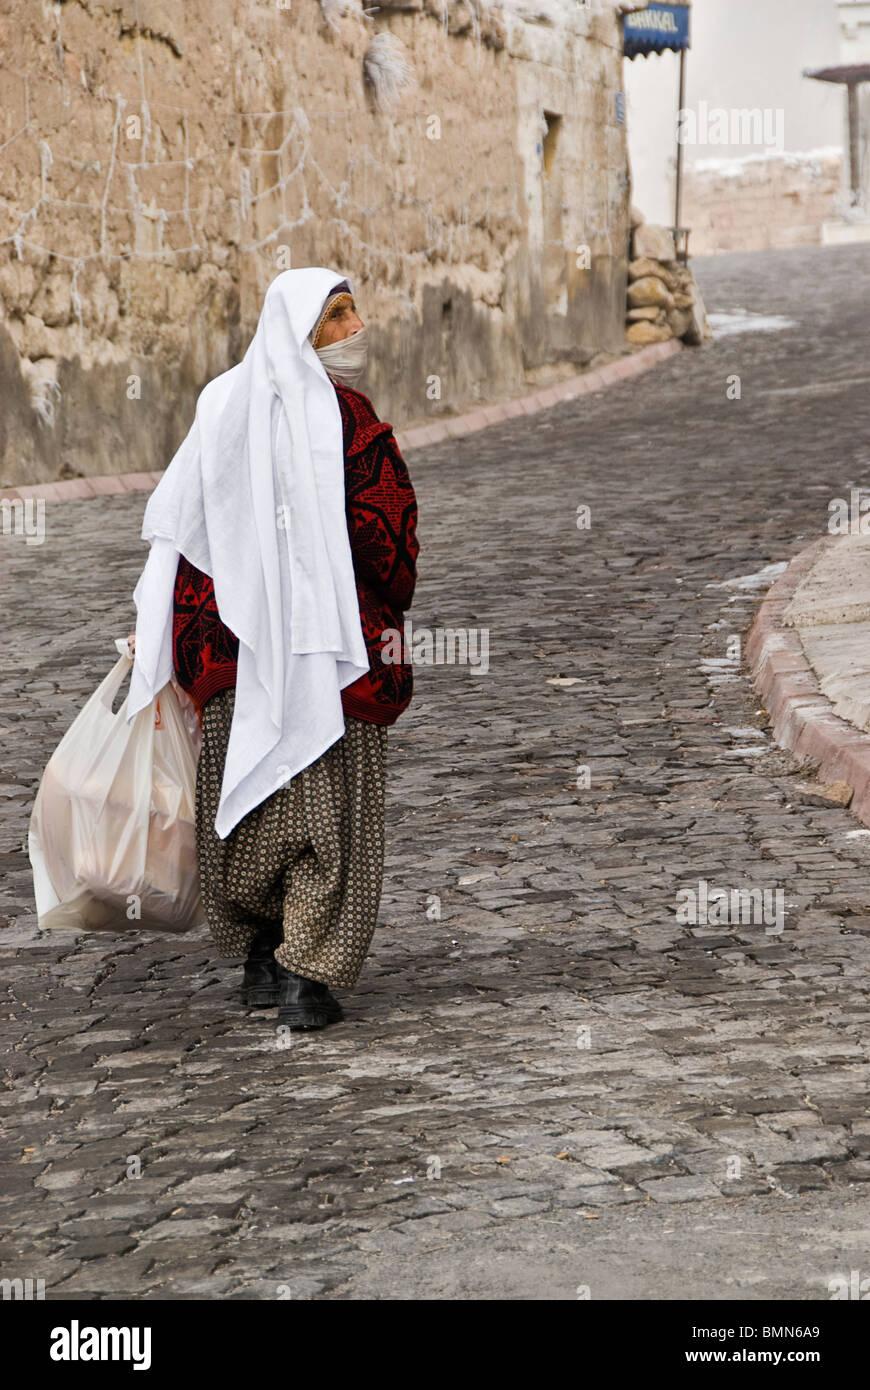 Old veiled woman walking on the streets. Capadoccia, Turkey, Asia. - Stock Image